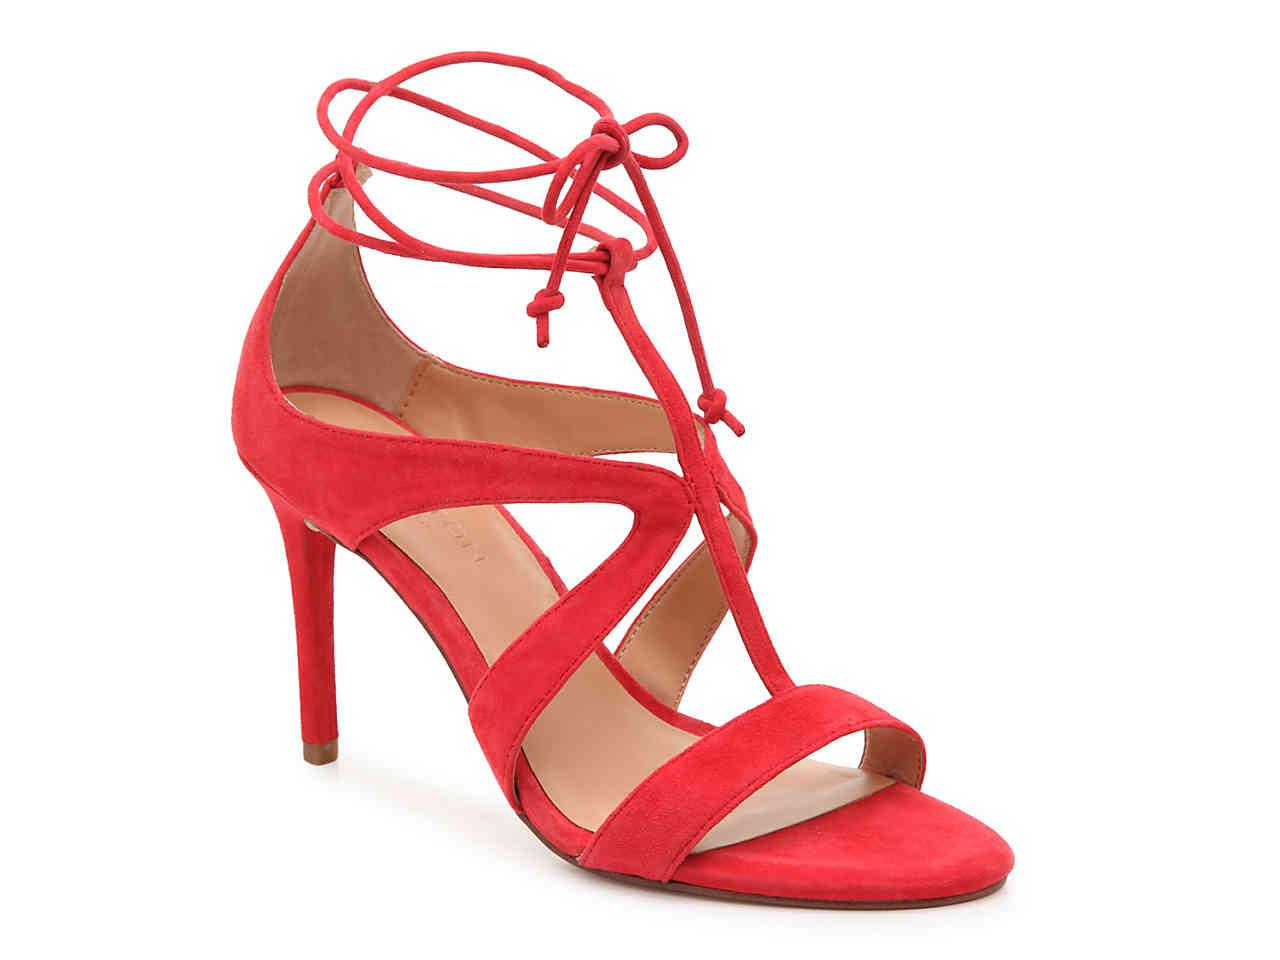 cfa493c1d1d9d8 Lyst - Halston Jordan Sandal in Red